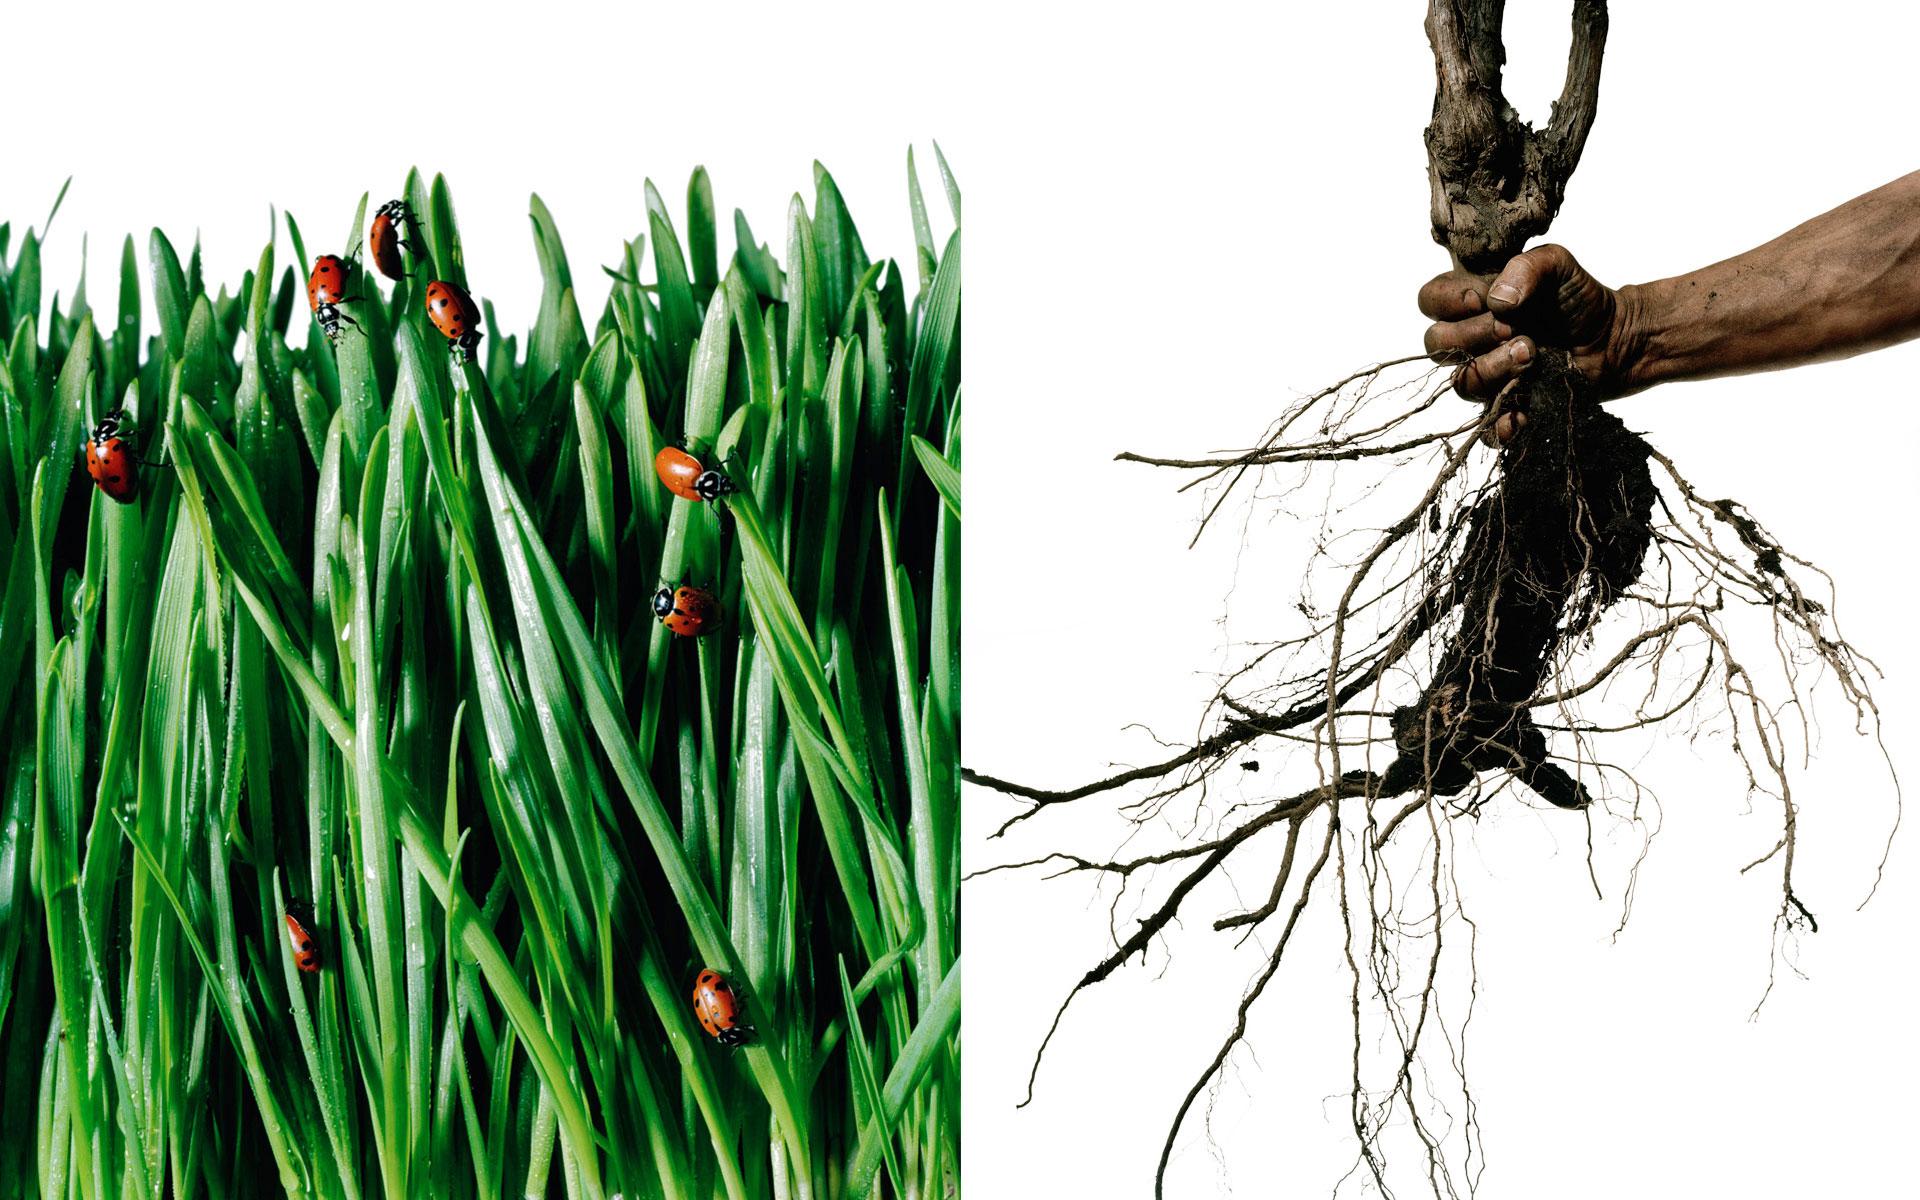 PR_grass-roots_sq.jpg